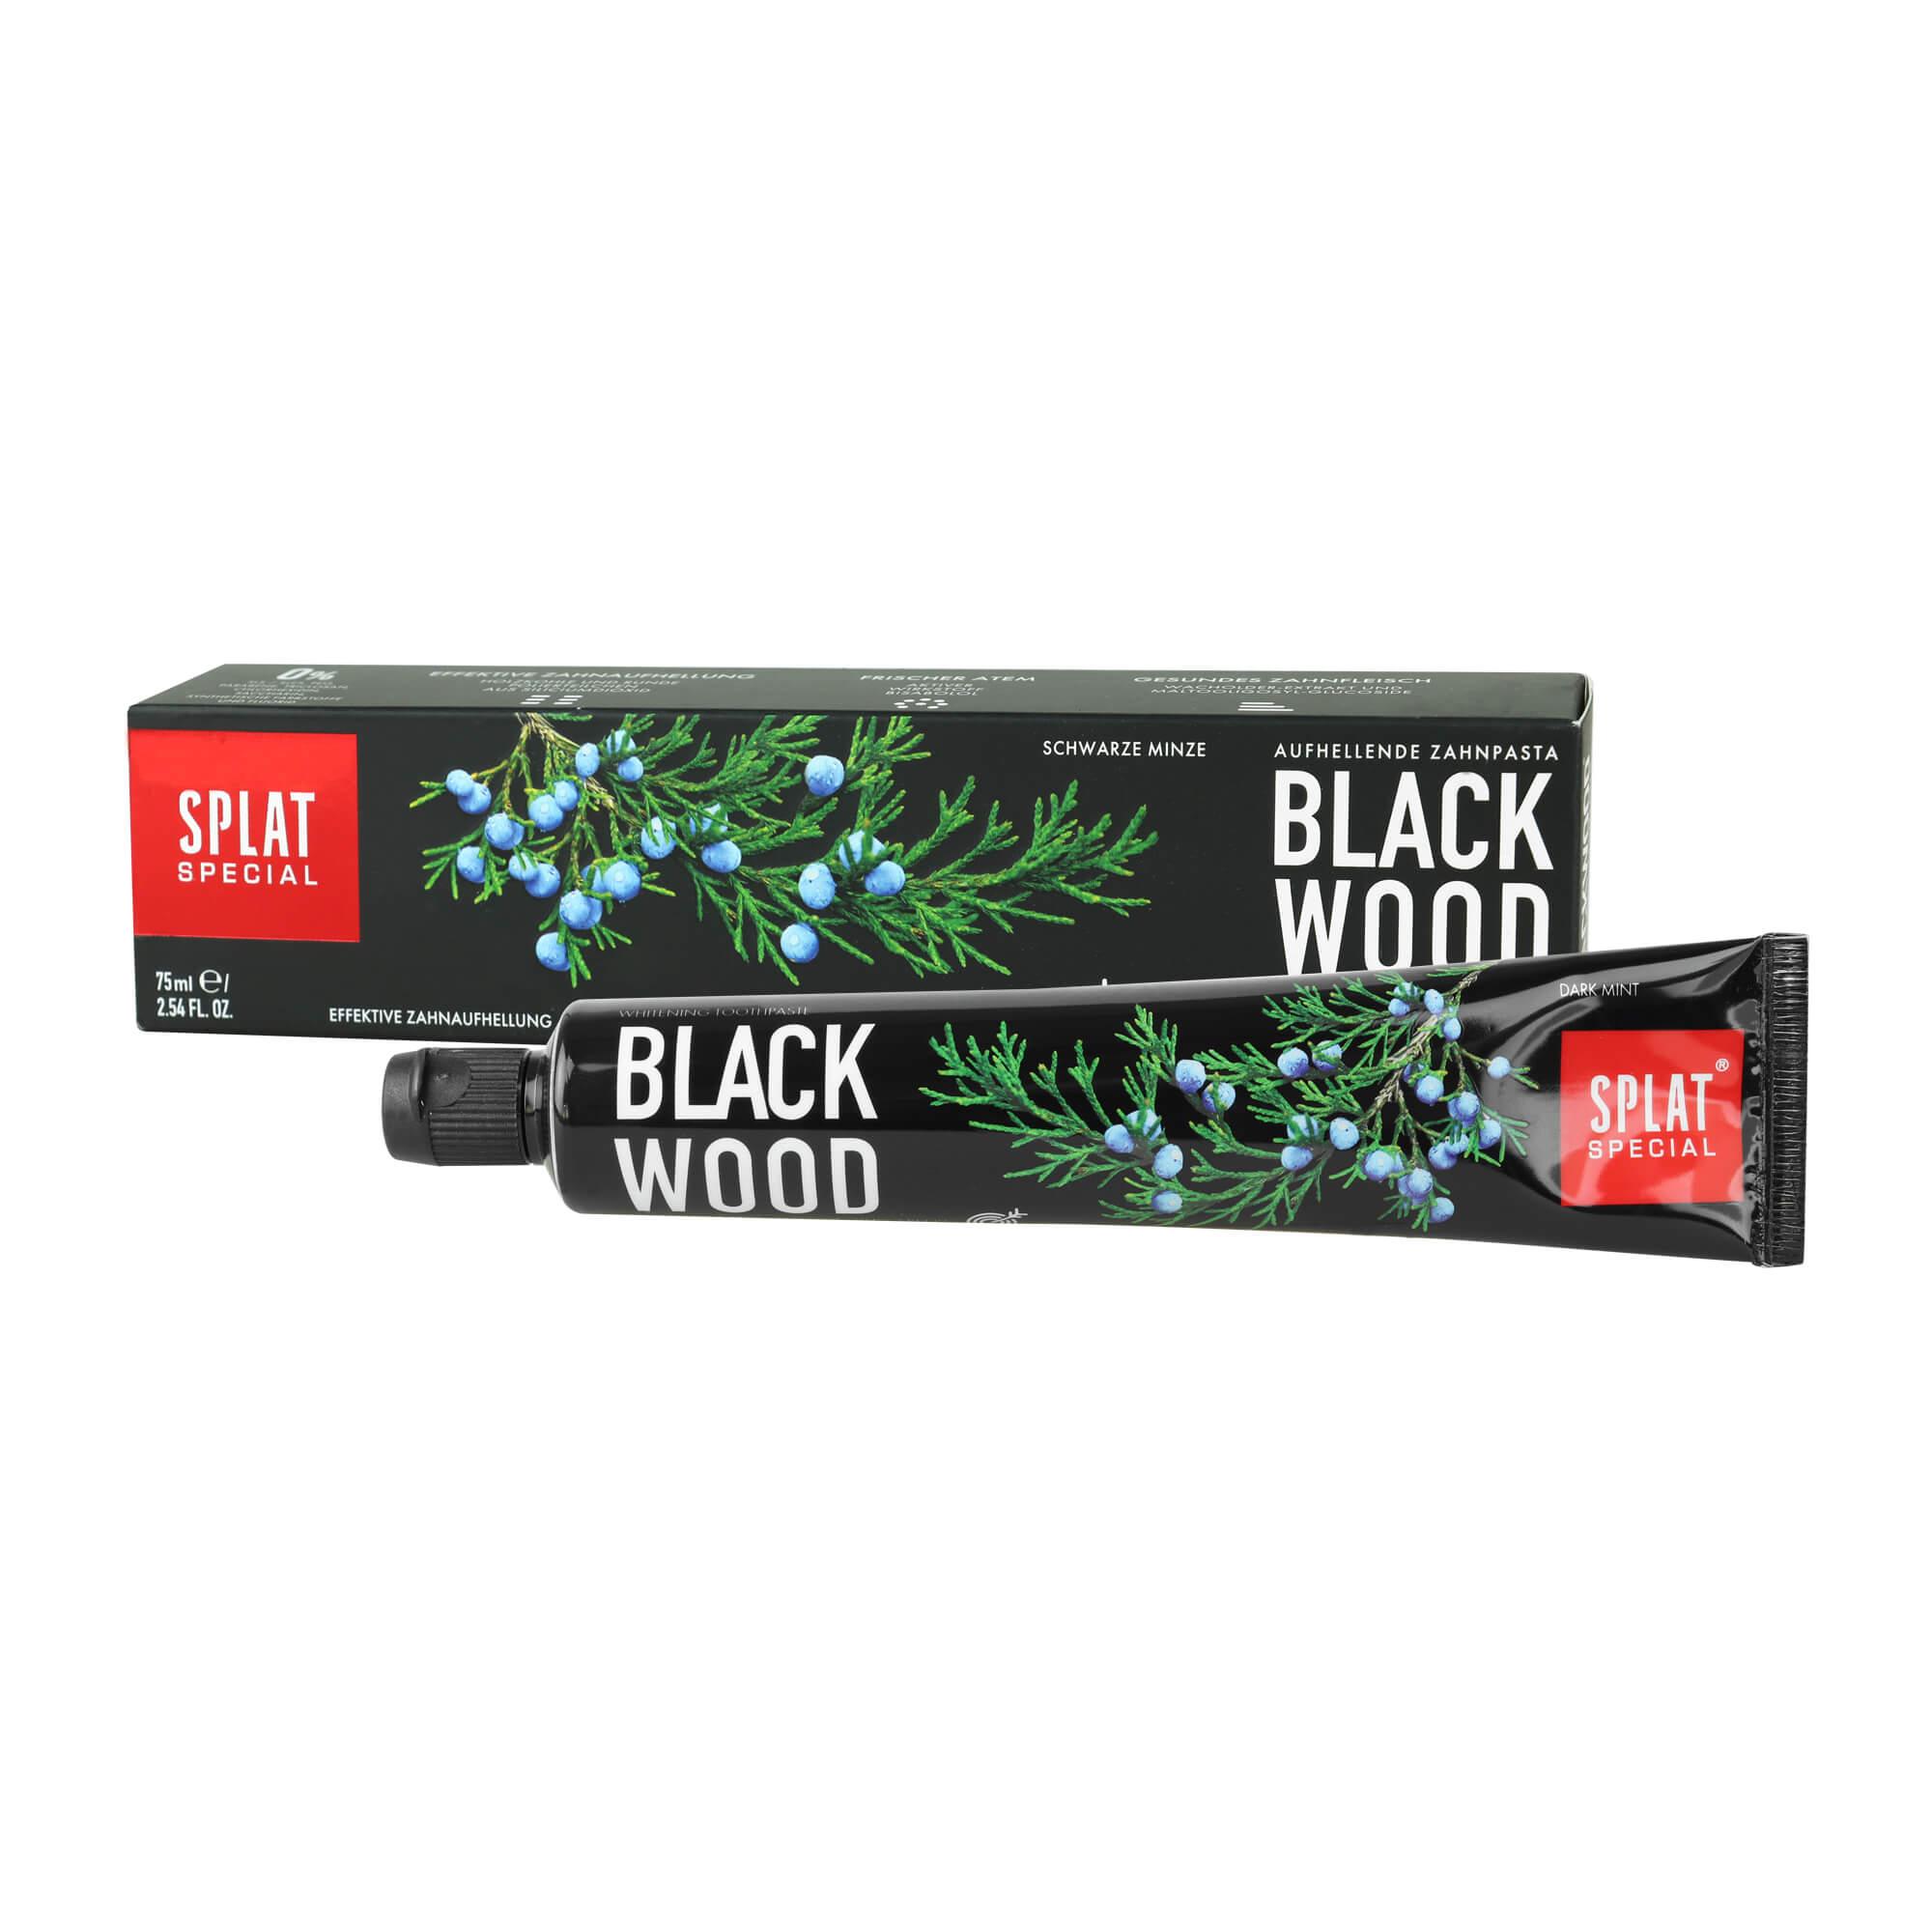 SPLAT Blackwood Whitening Zahnpasta